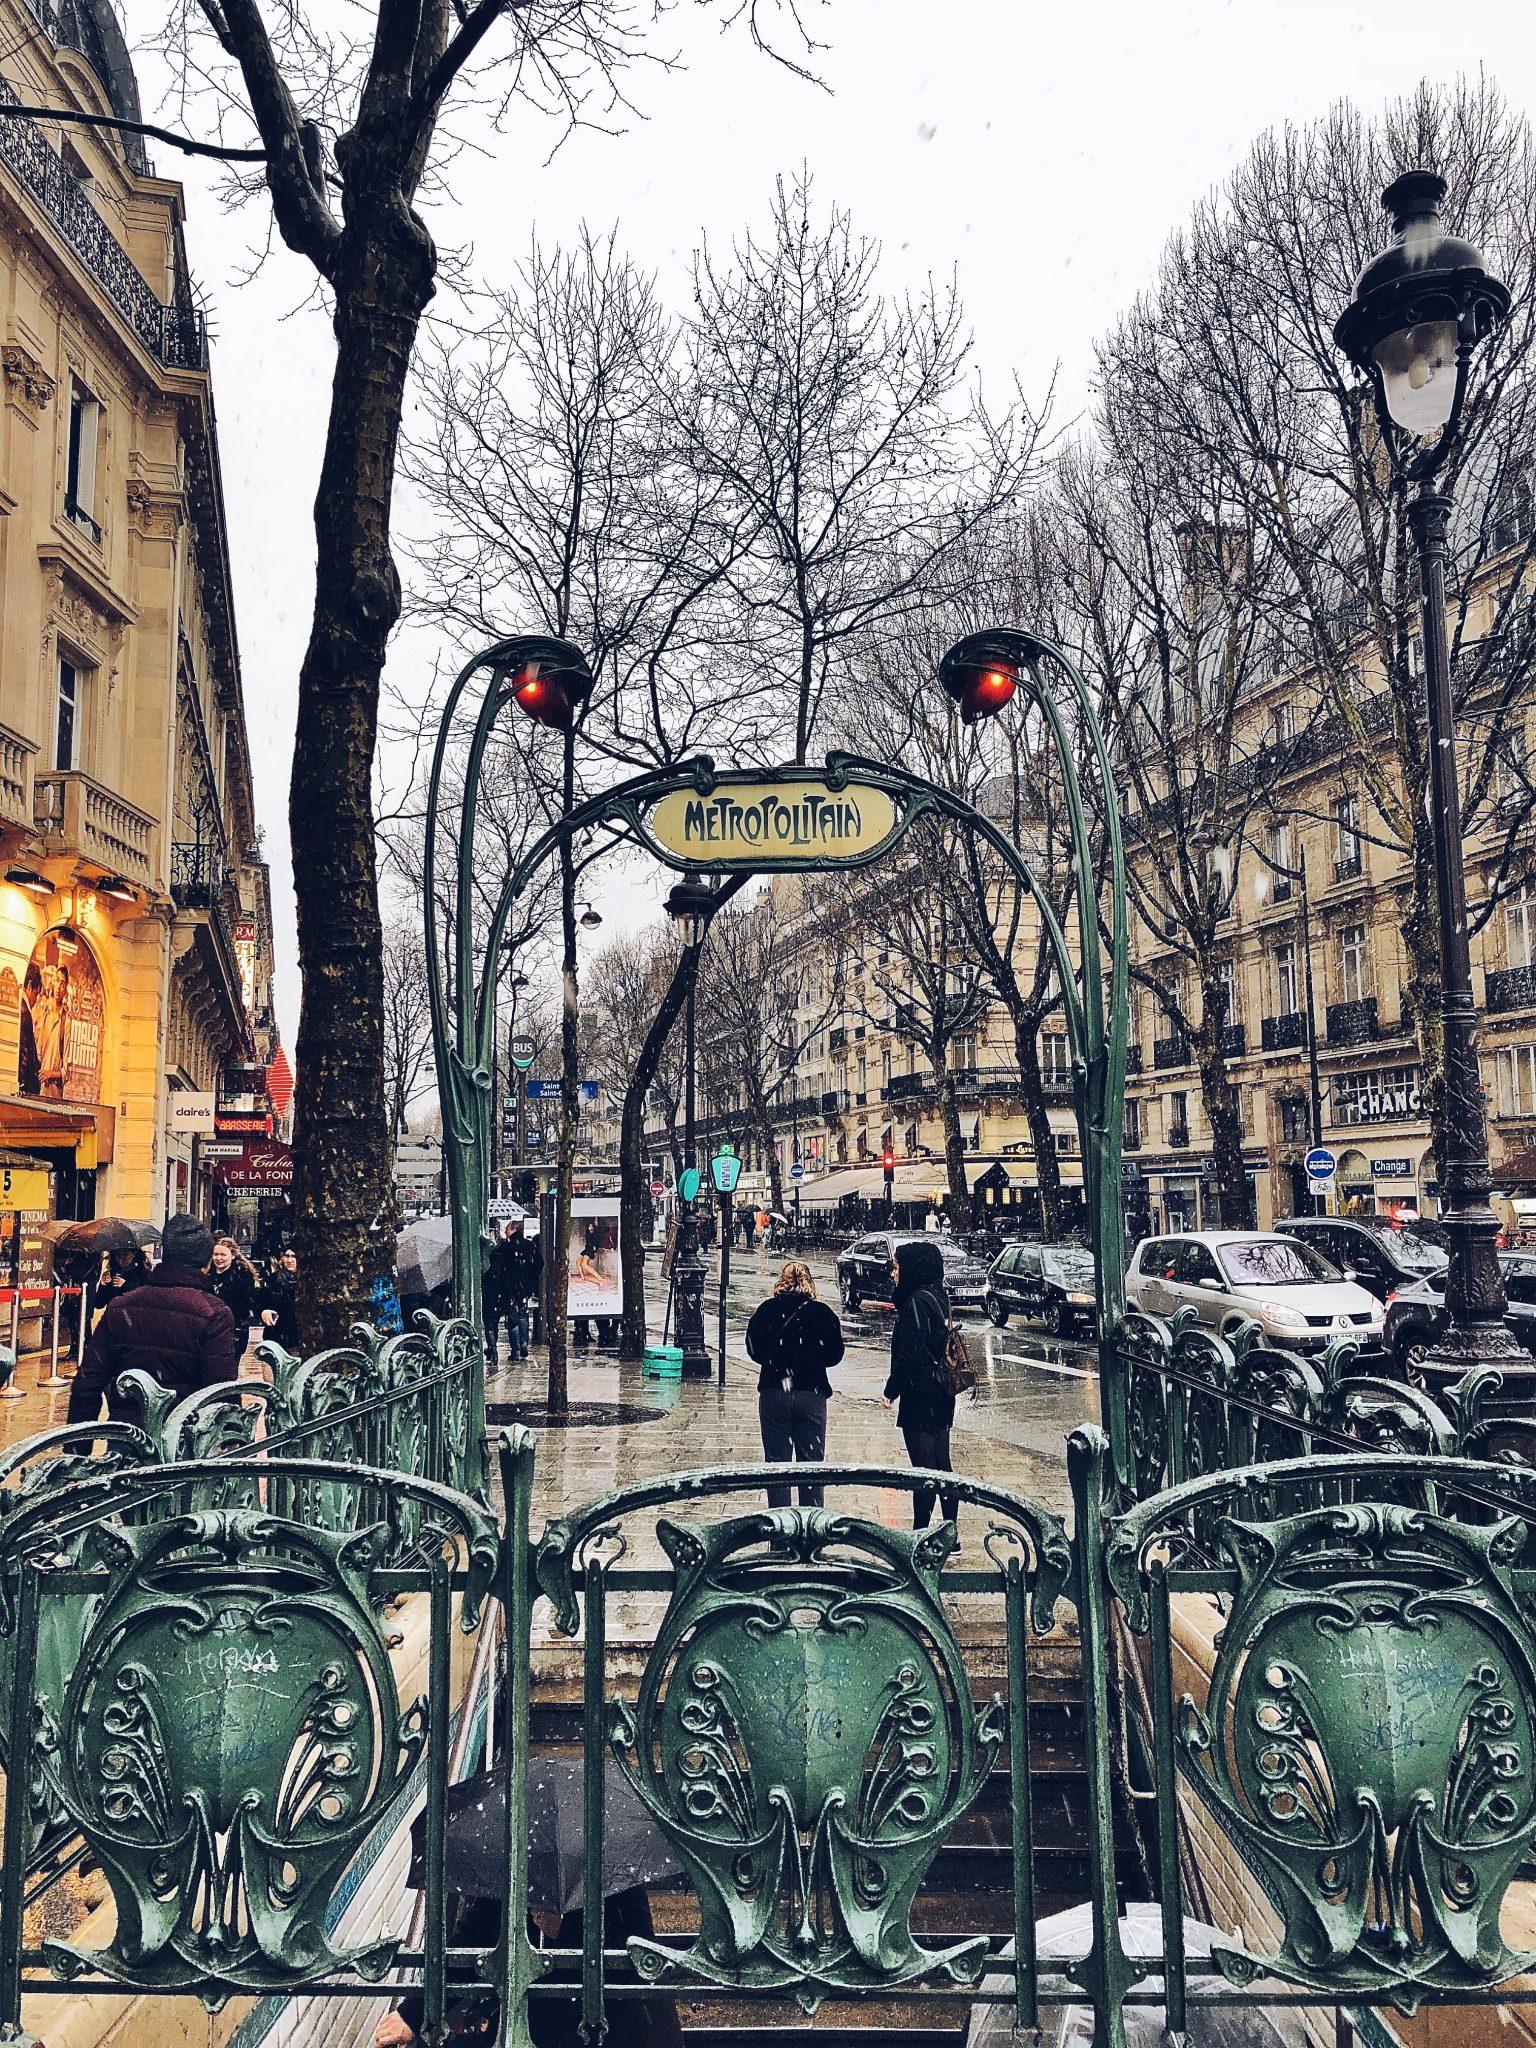 fermata della metropolitana di Parigi - tatianaberlaffa.com